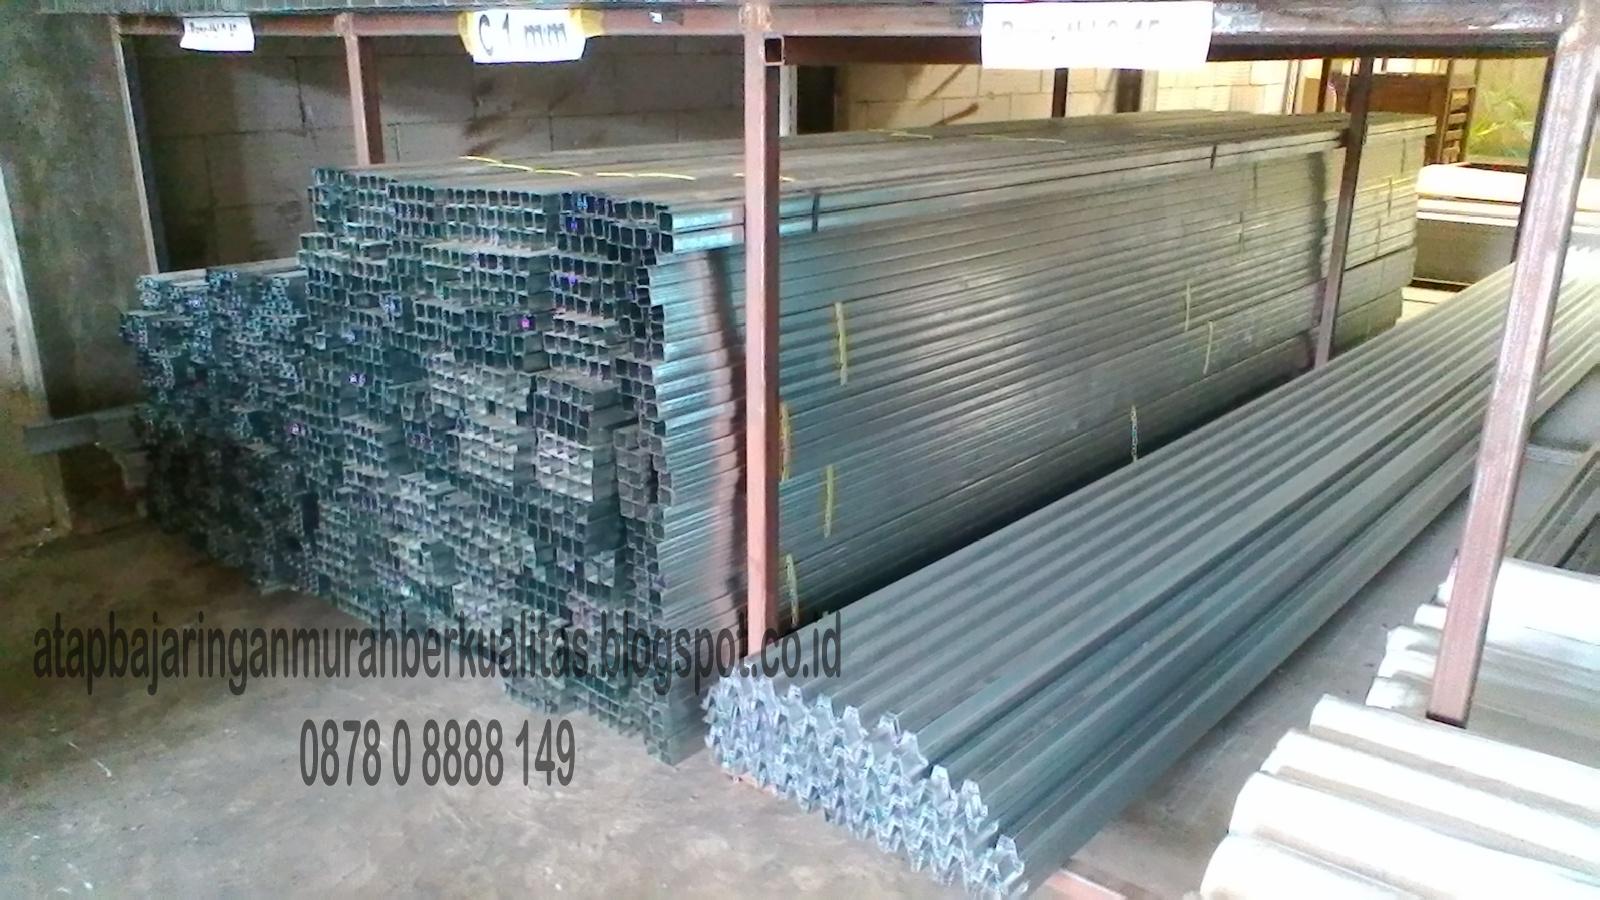 murah mana baja ringan atau kayu jual rangka atap 087808888149 perbedaan